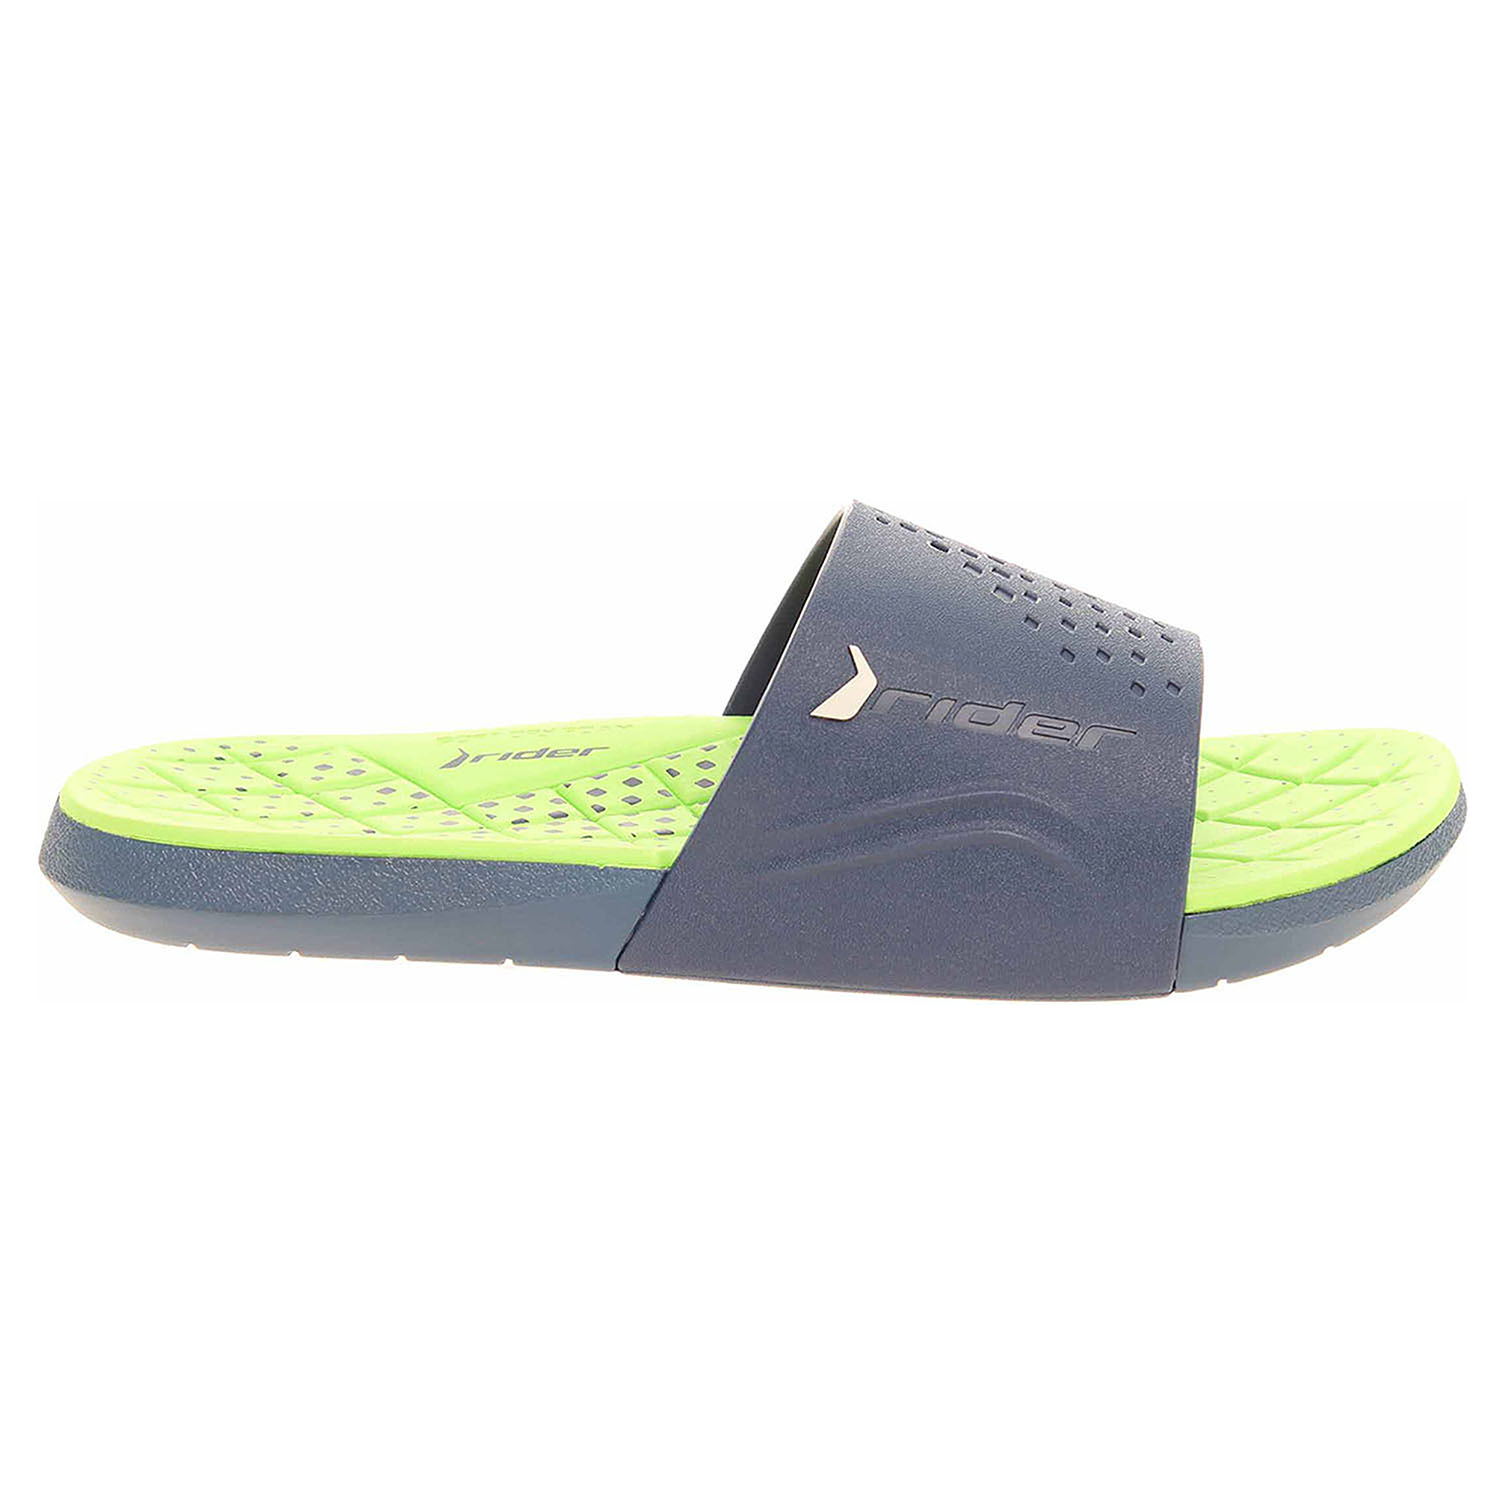 Ecco Rider pánské plážové pantofle 82209 23563 blue-green 24500174 406df0b2dae